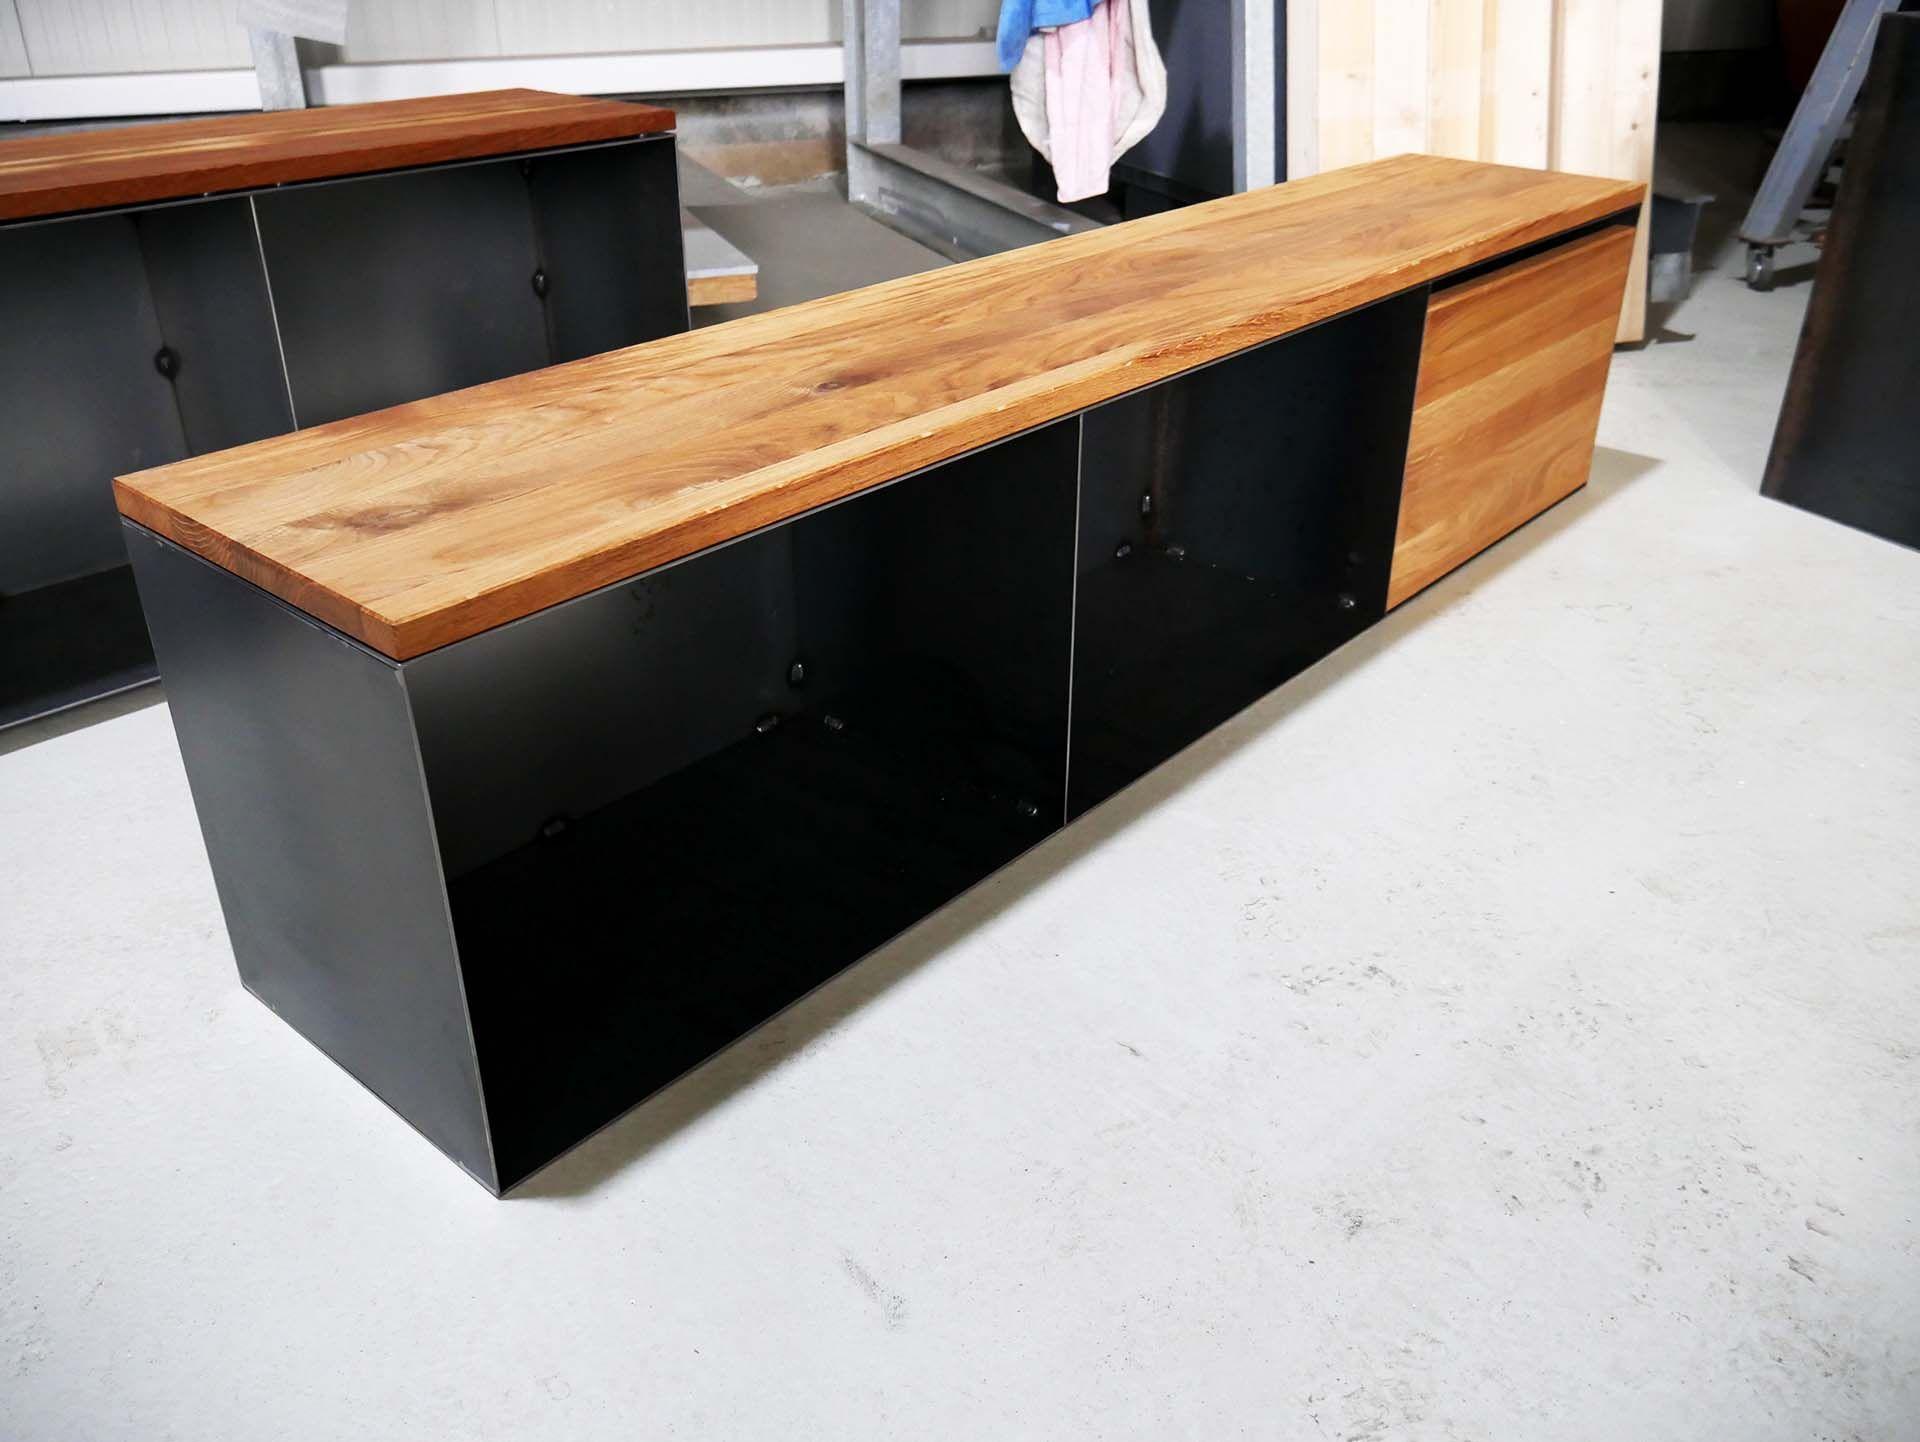 Sitzbank P5 Holz Metall Mit Stauraum Kamin Holz Aufbewahrung